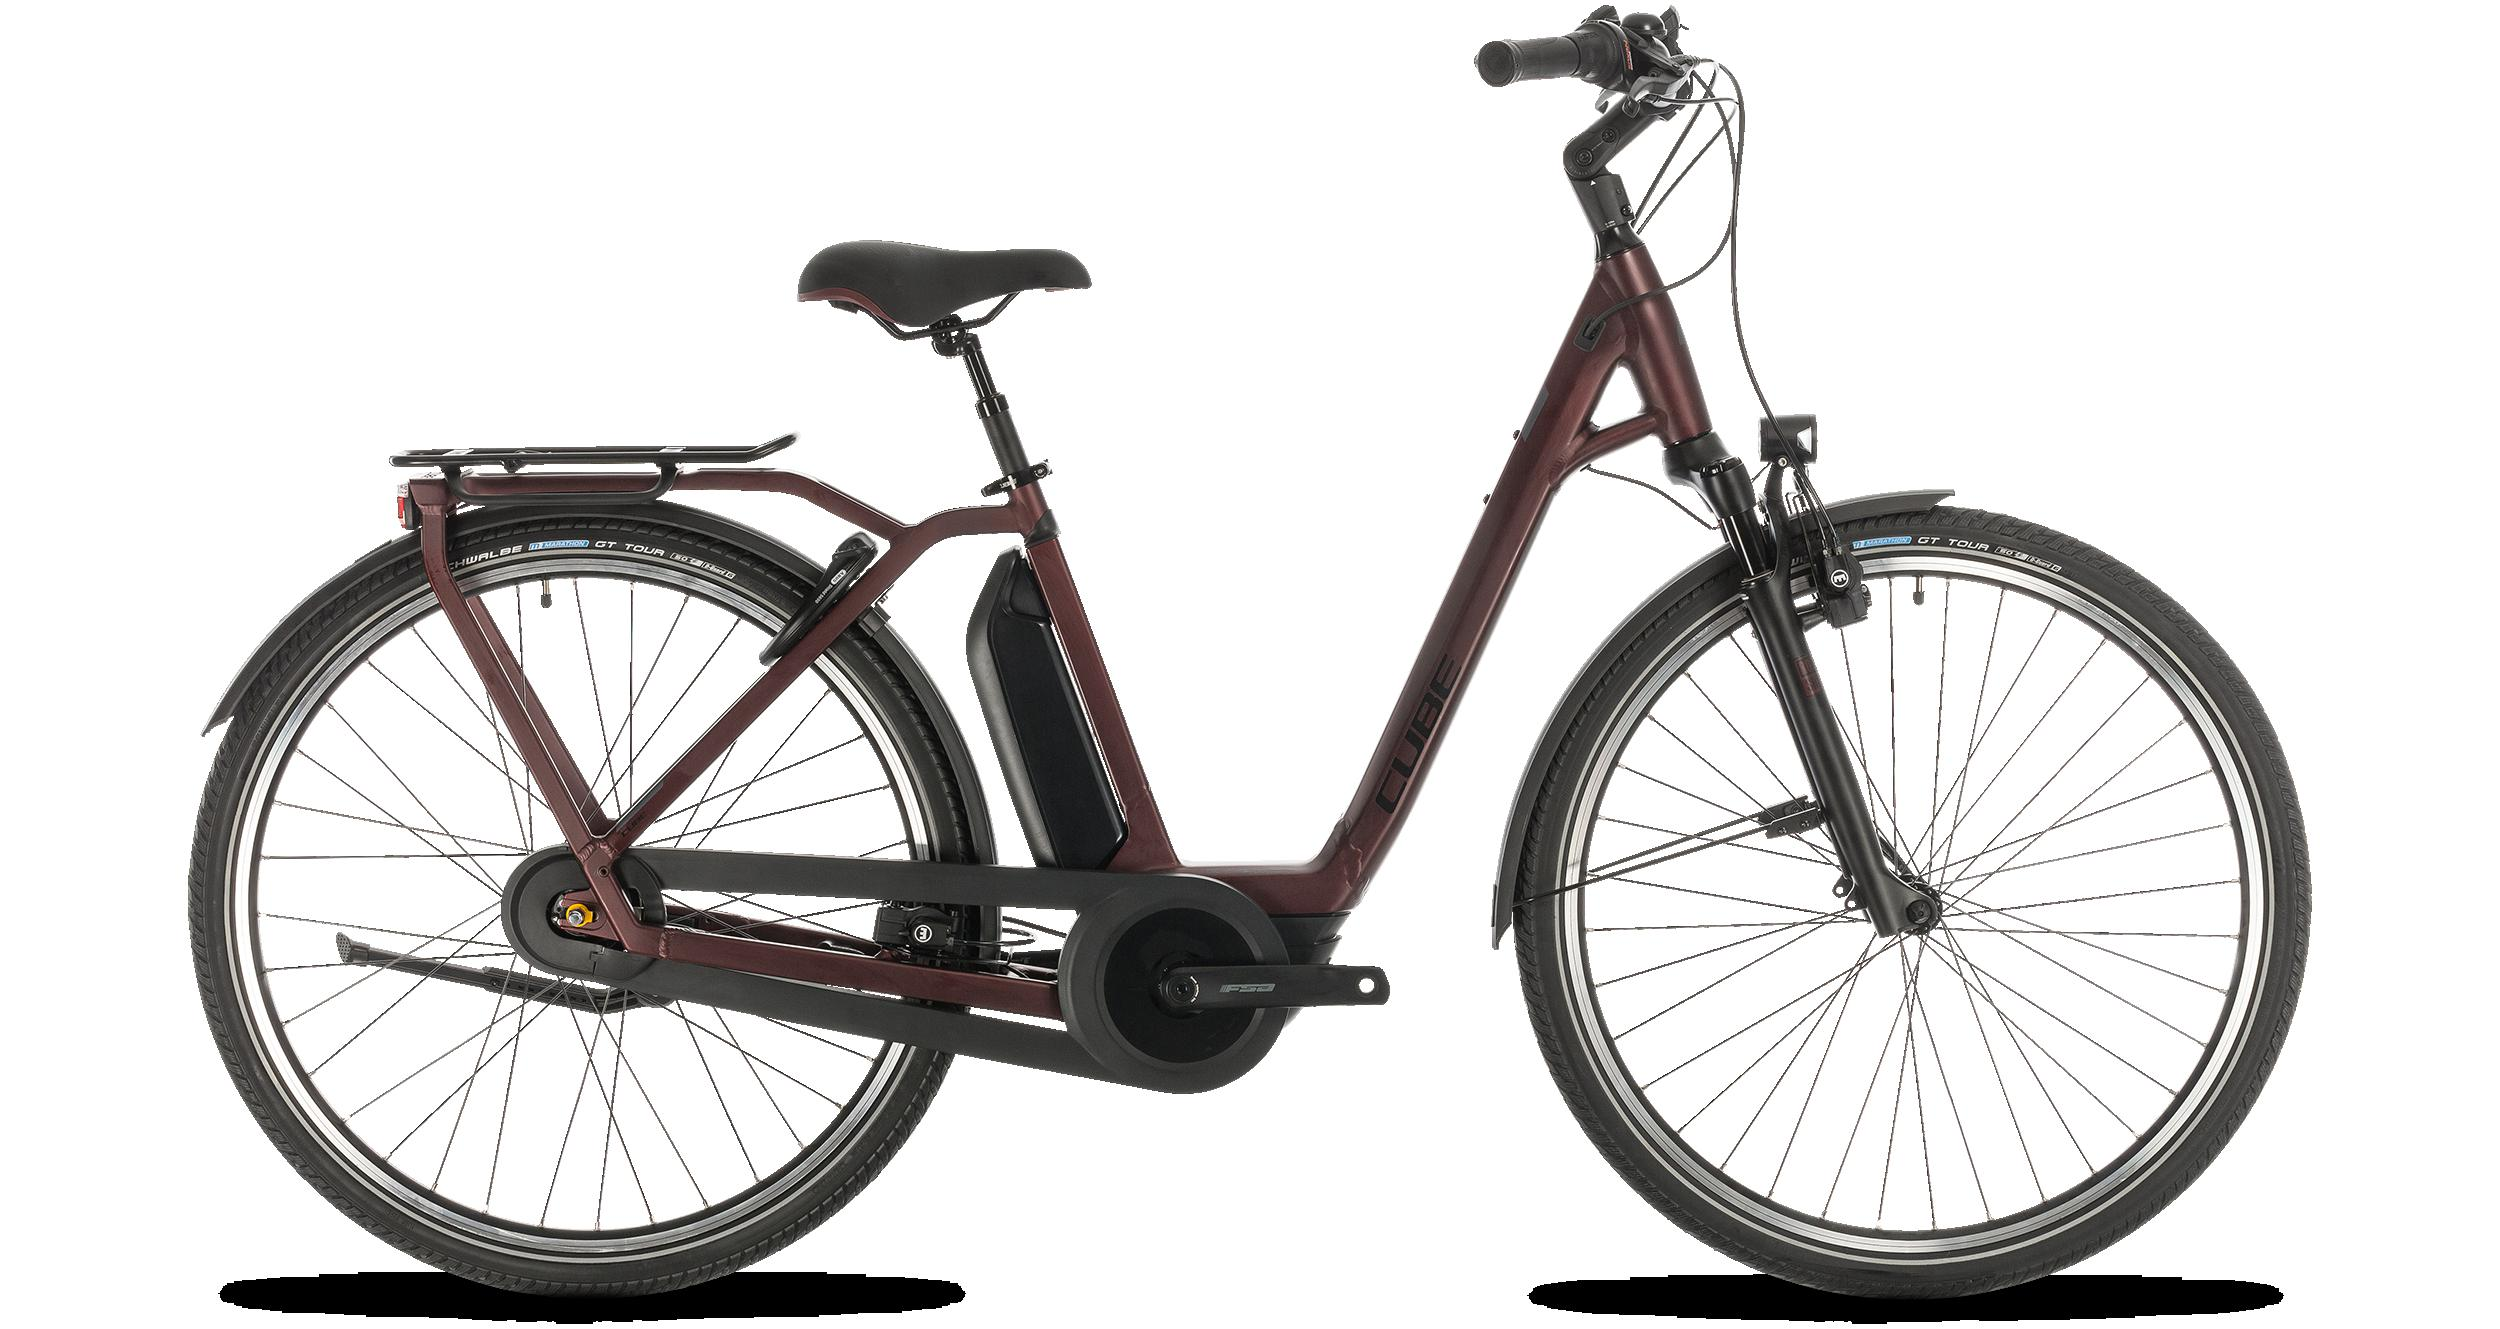 cube town hybrid exc rt 500 red n black trekking e bike 2020. Black Bedroom Furniture Sets. Home Design Ideas